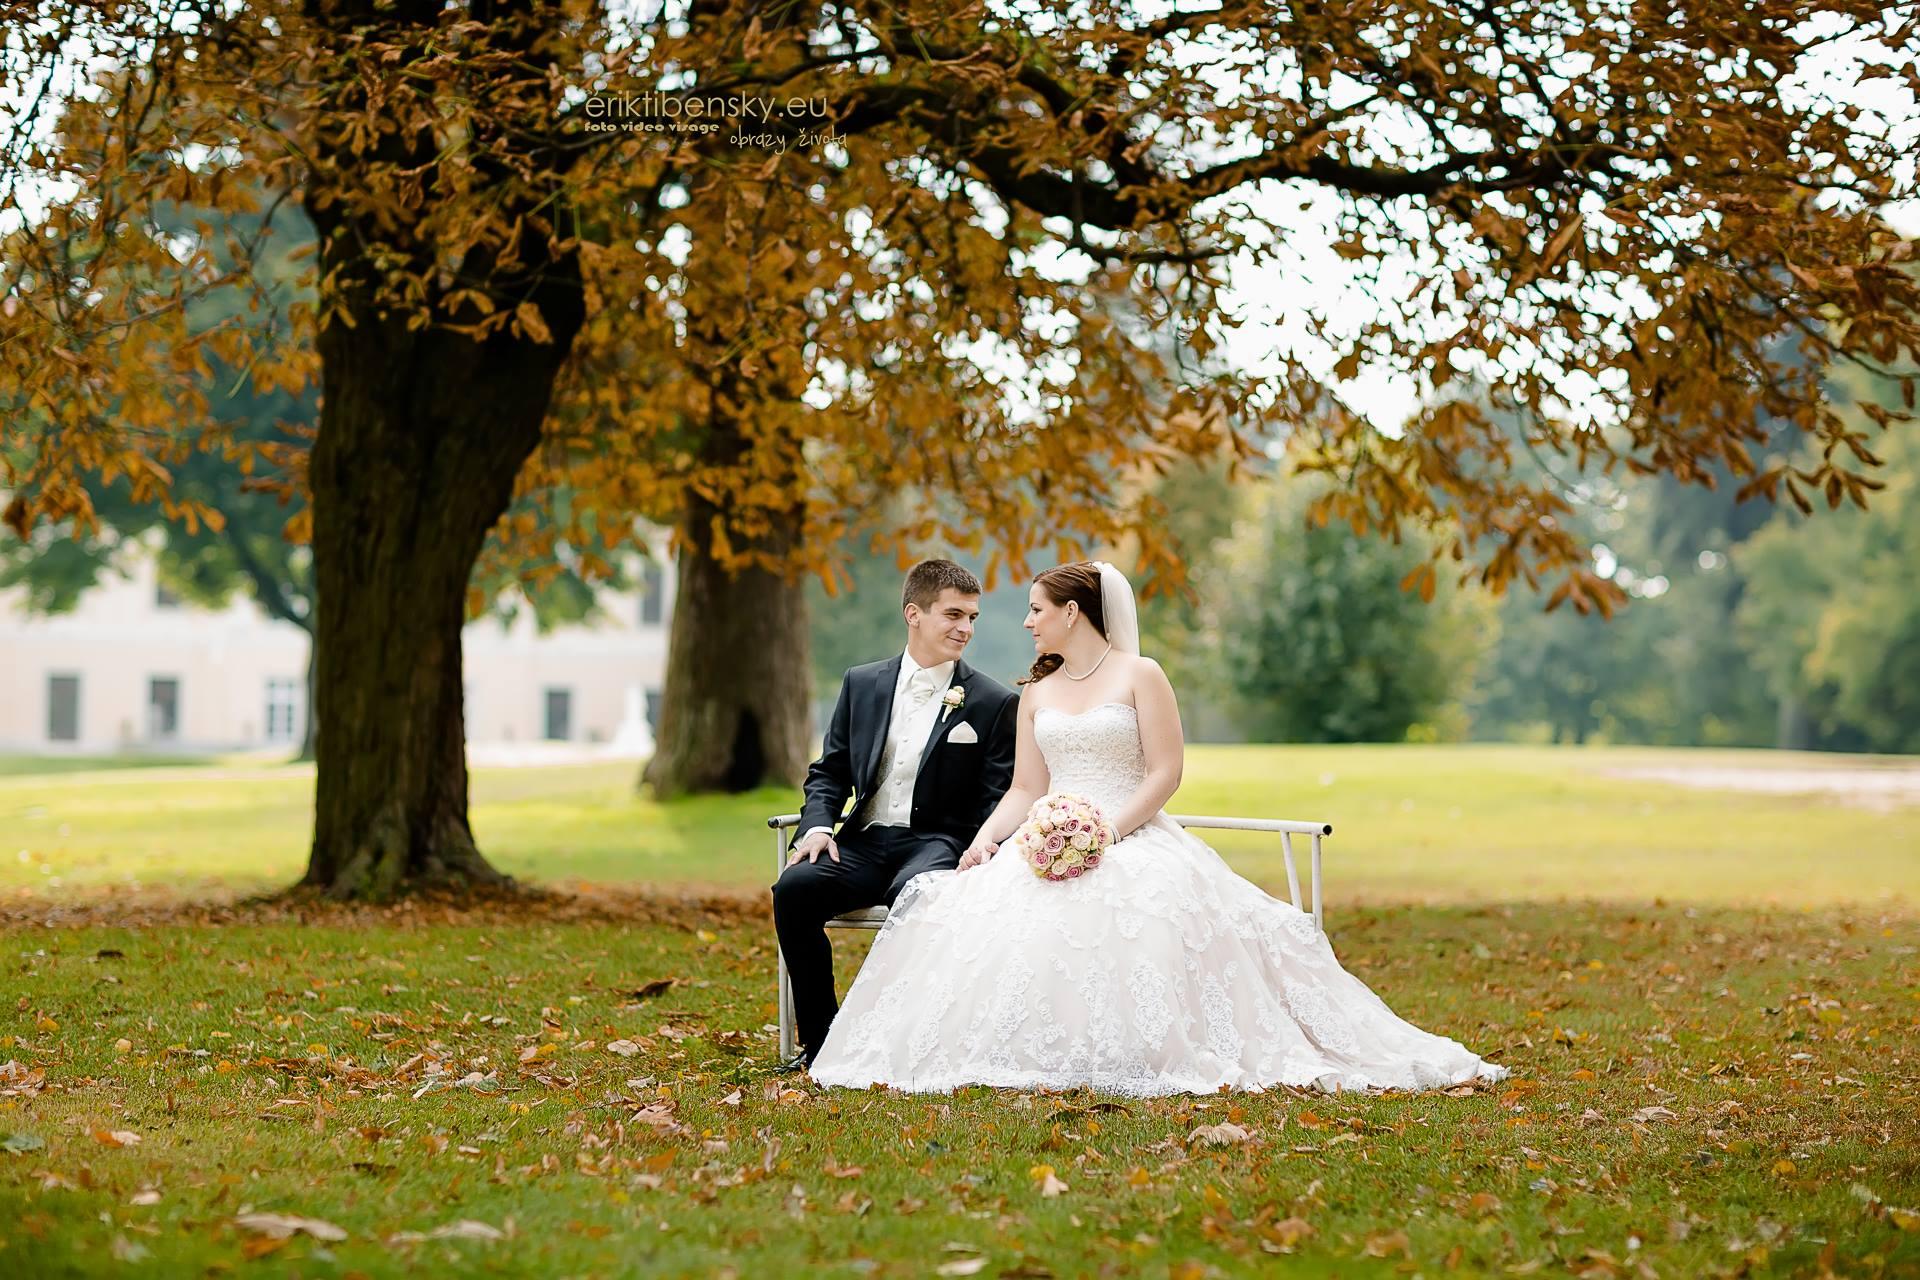 eriktibensky-eu-svadobny-fotograf-wedding-photographer-3084